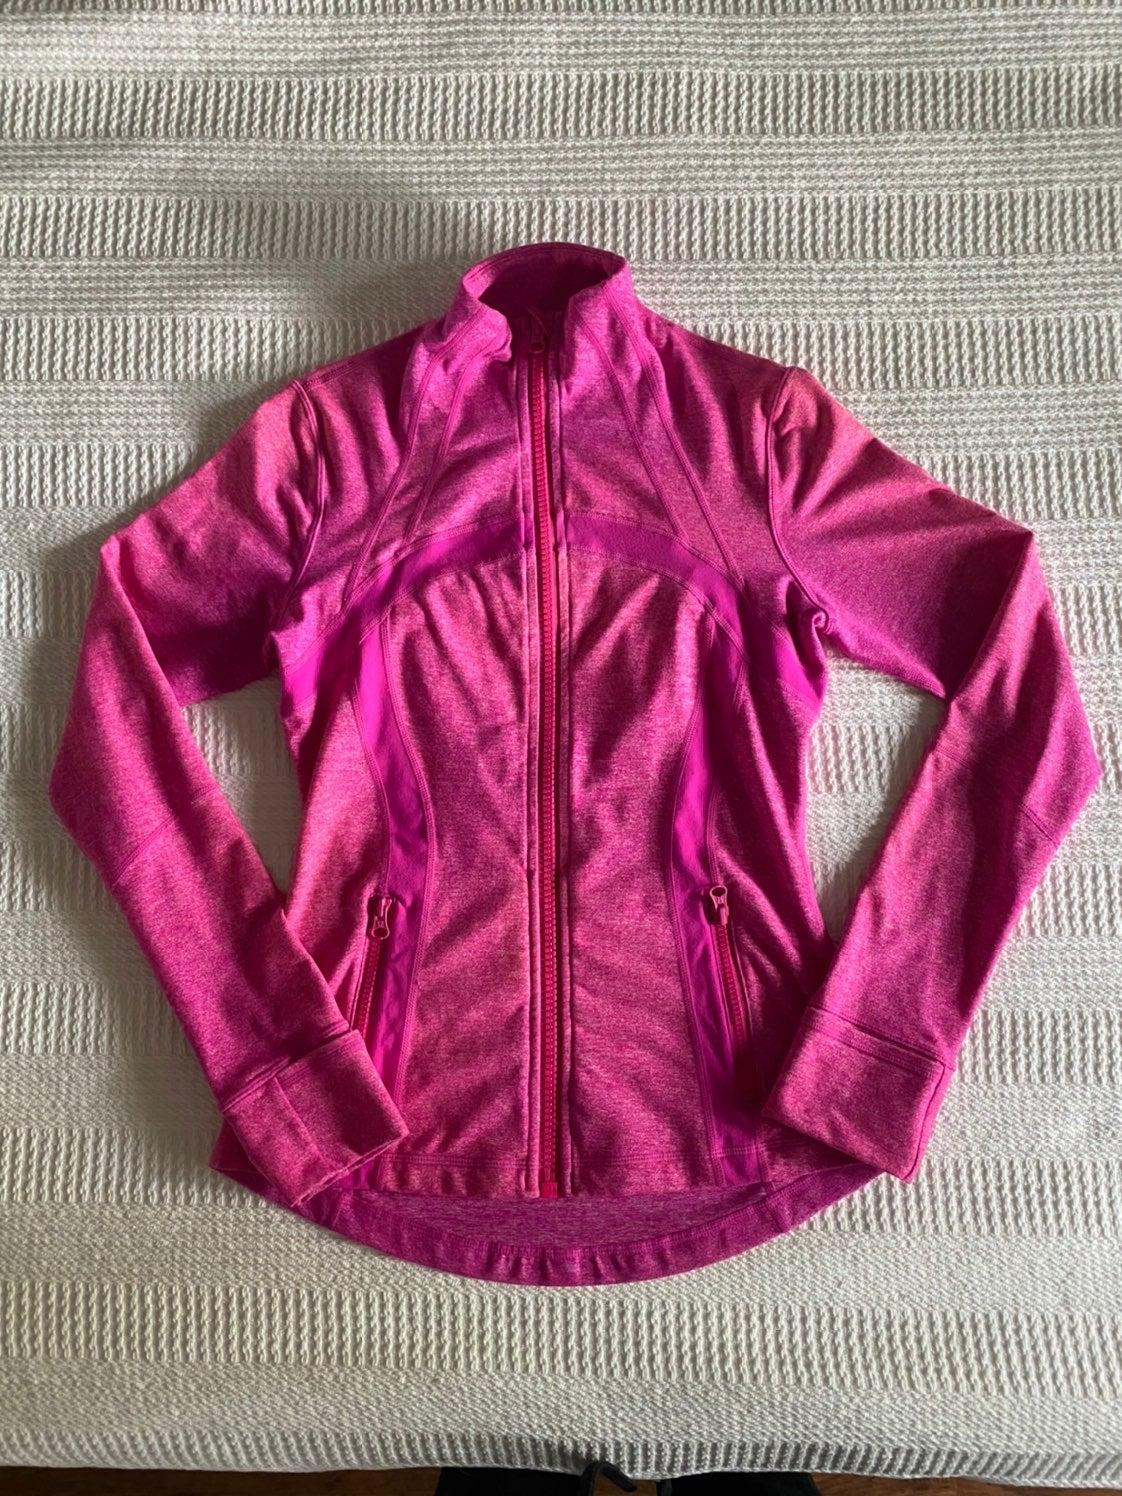 Lululemon jacket, pink